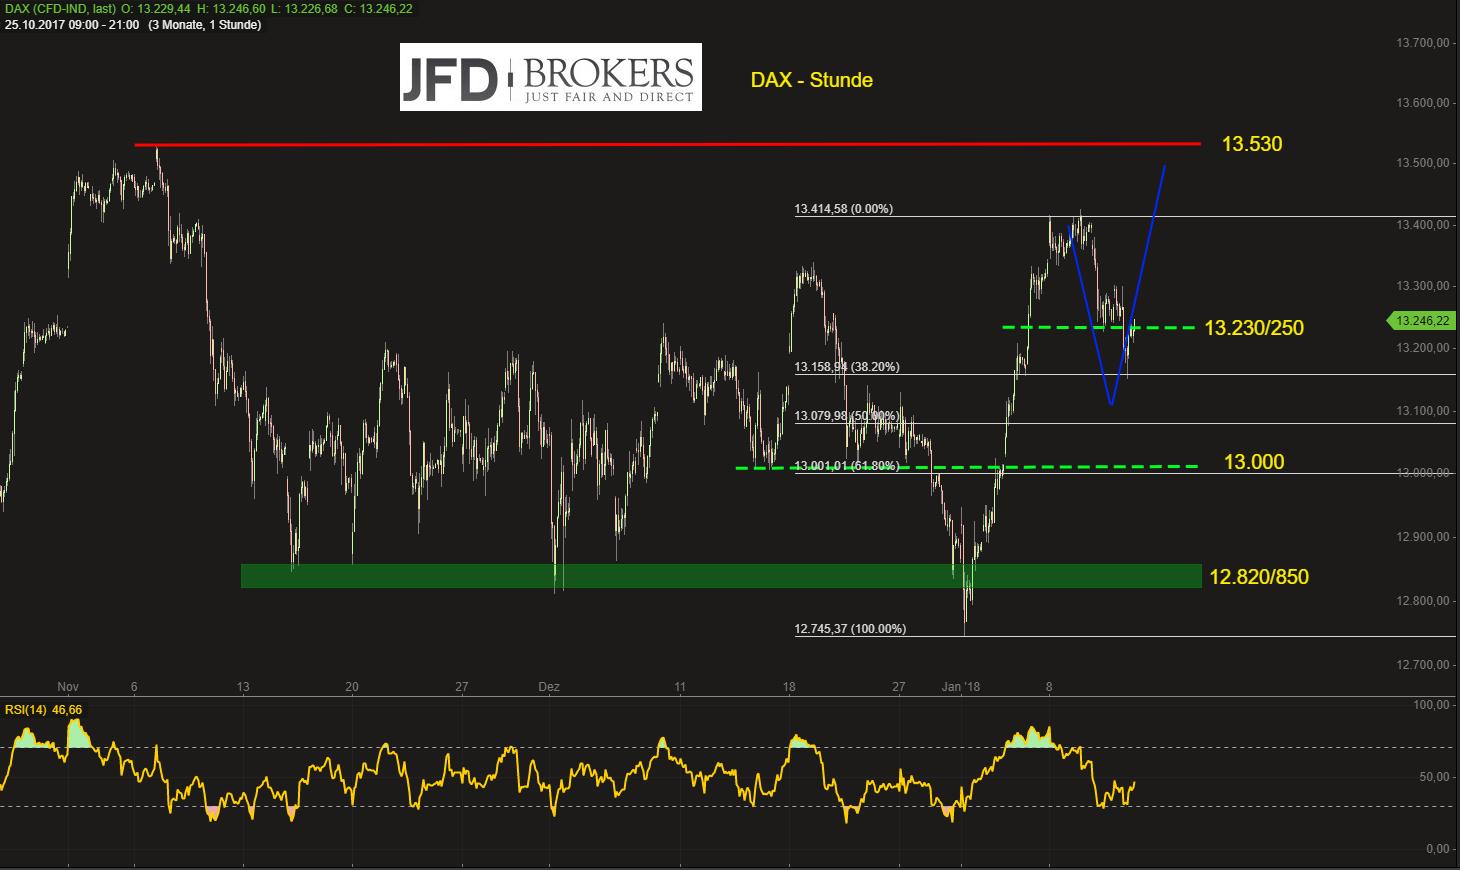 DAX-oberhalb-von-13-080-100-Punkten-aus-der-Handelswoche-Kommentar-JFD-Brokers-GodmodeTrader.de-2